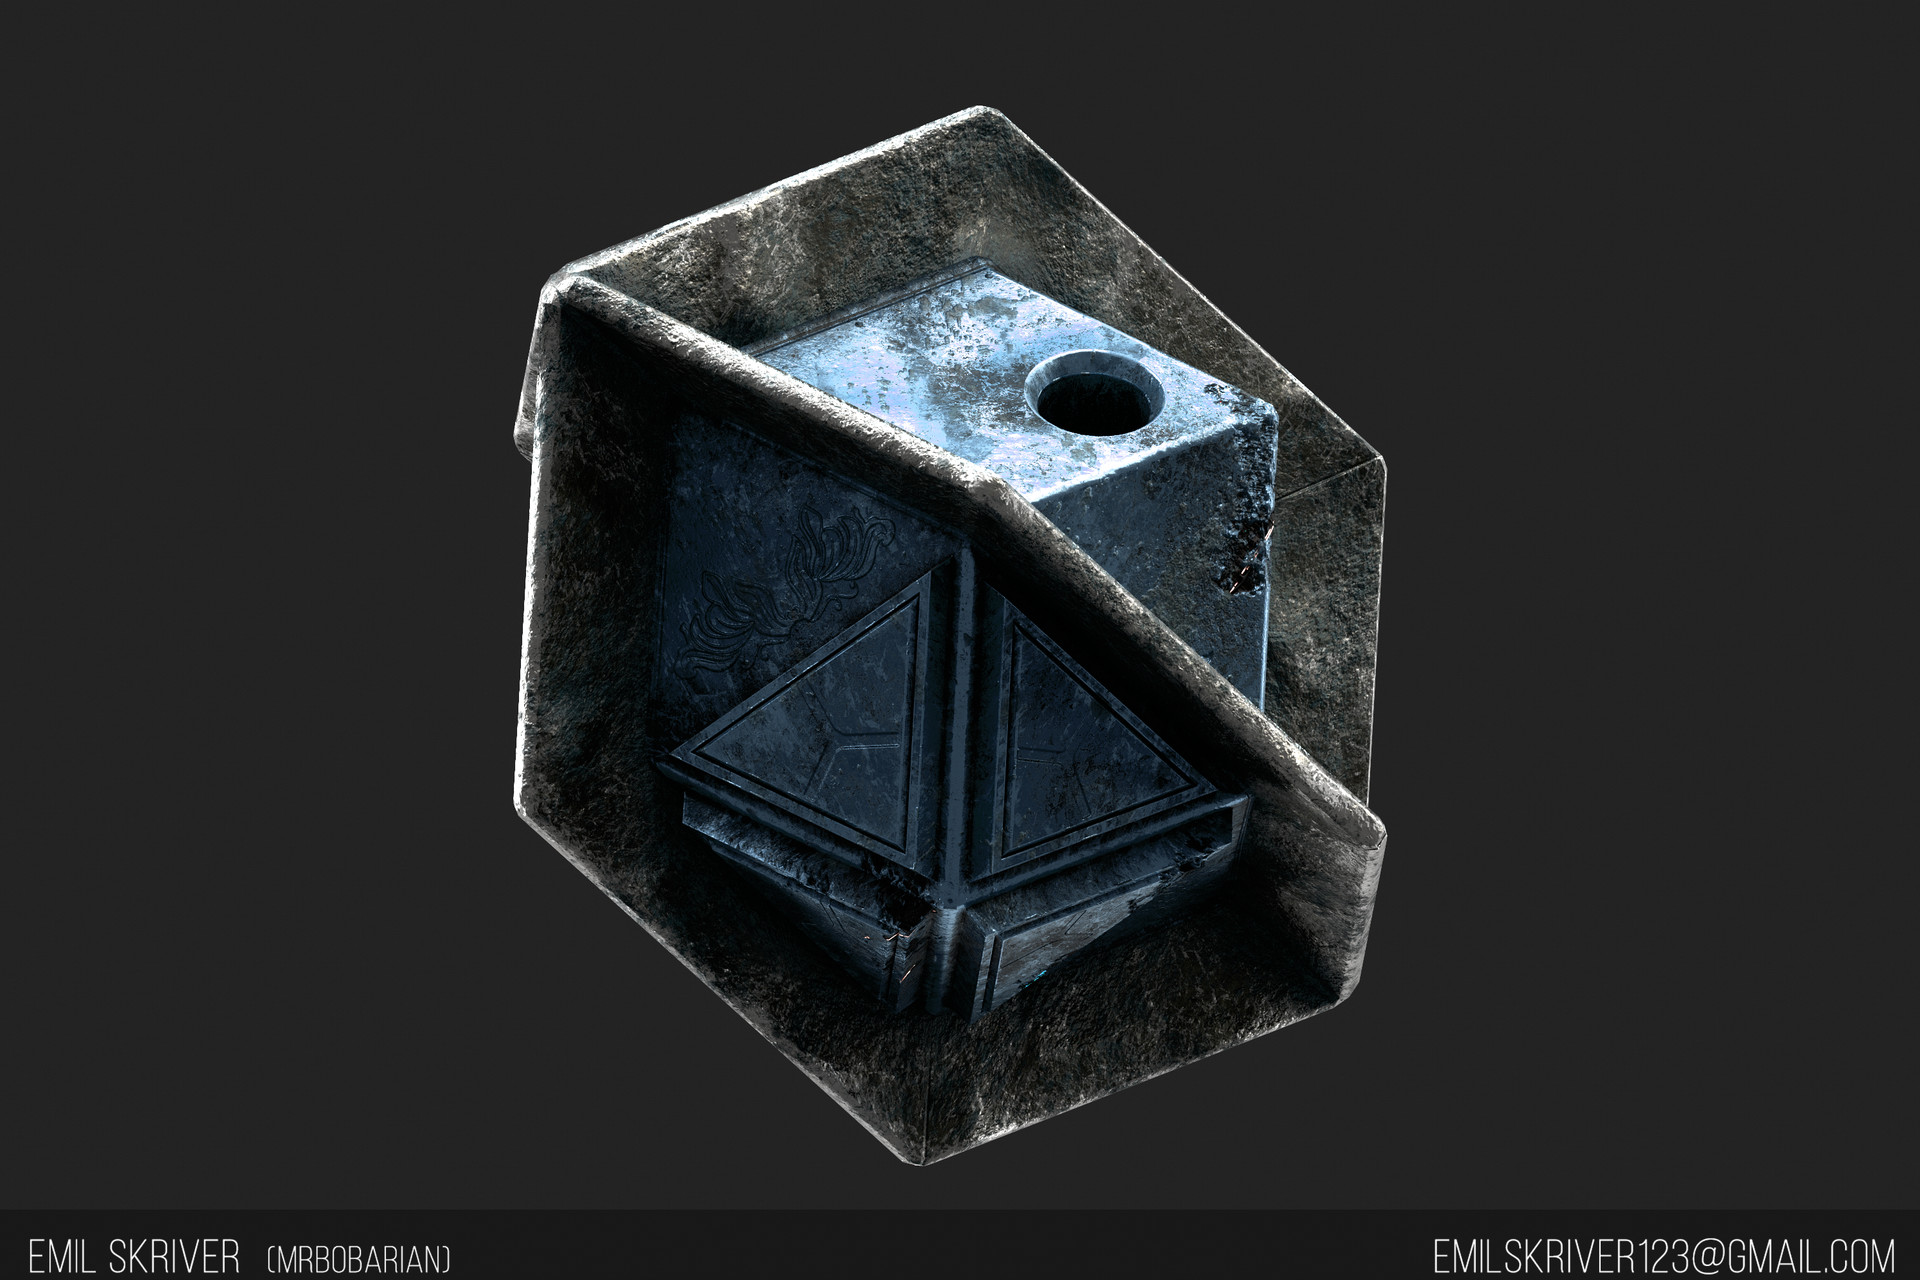 Emil skriver power gadget render03